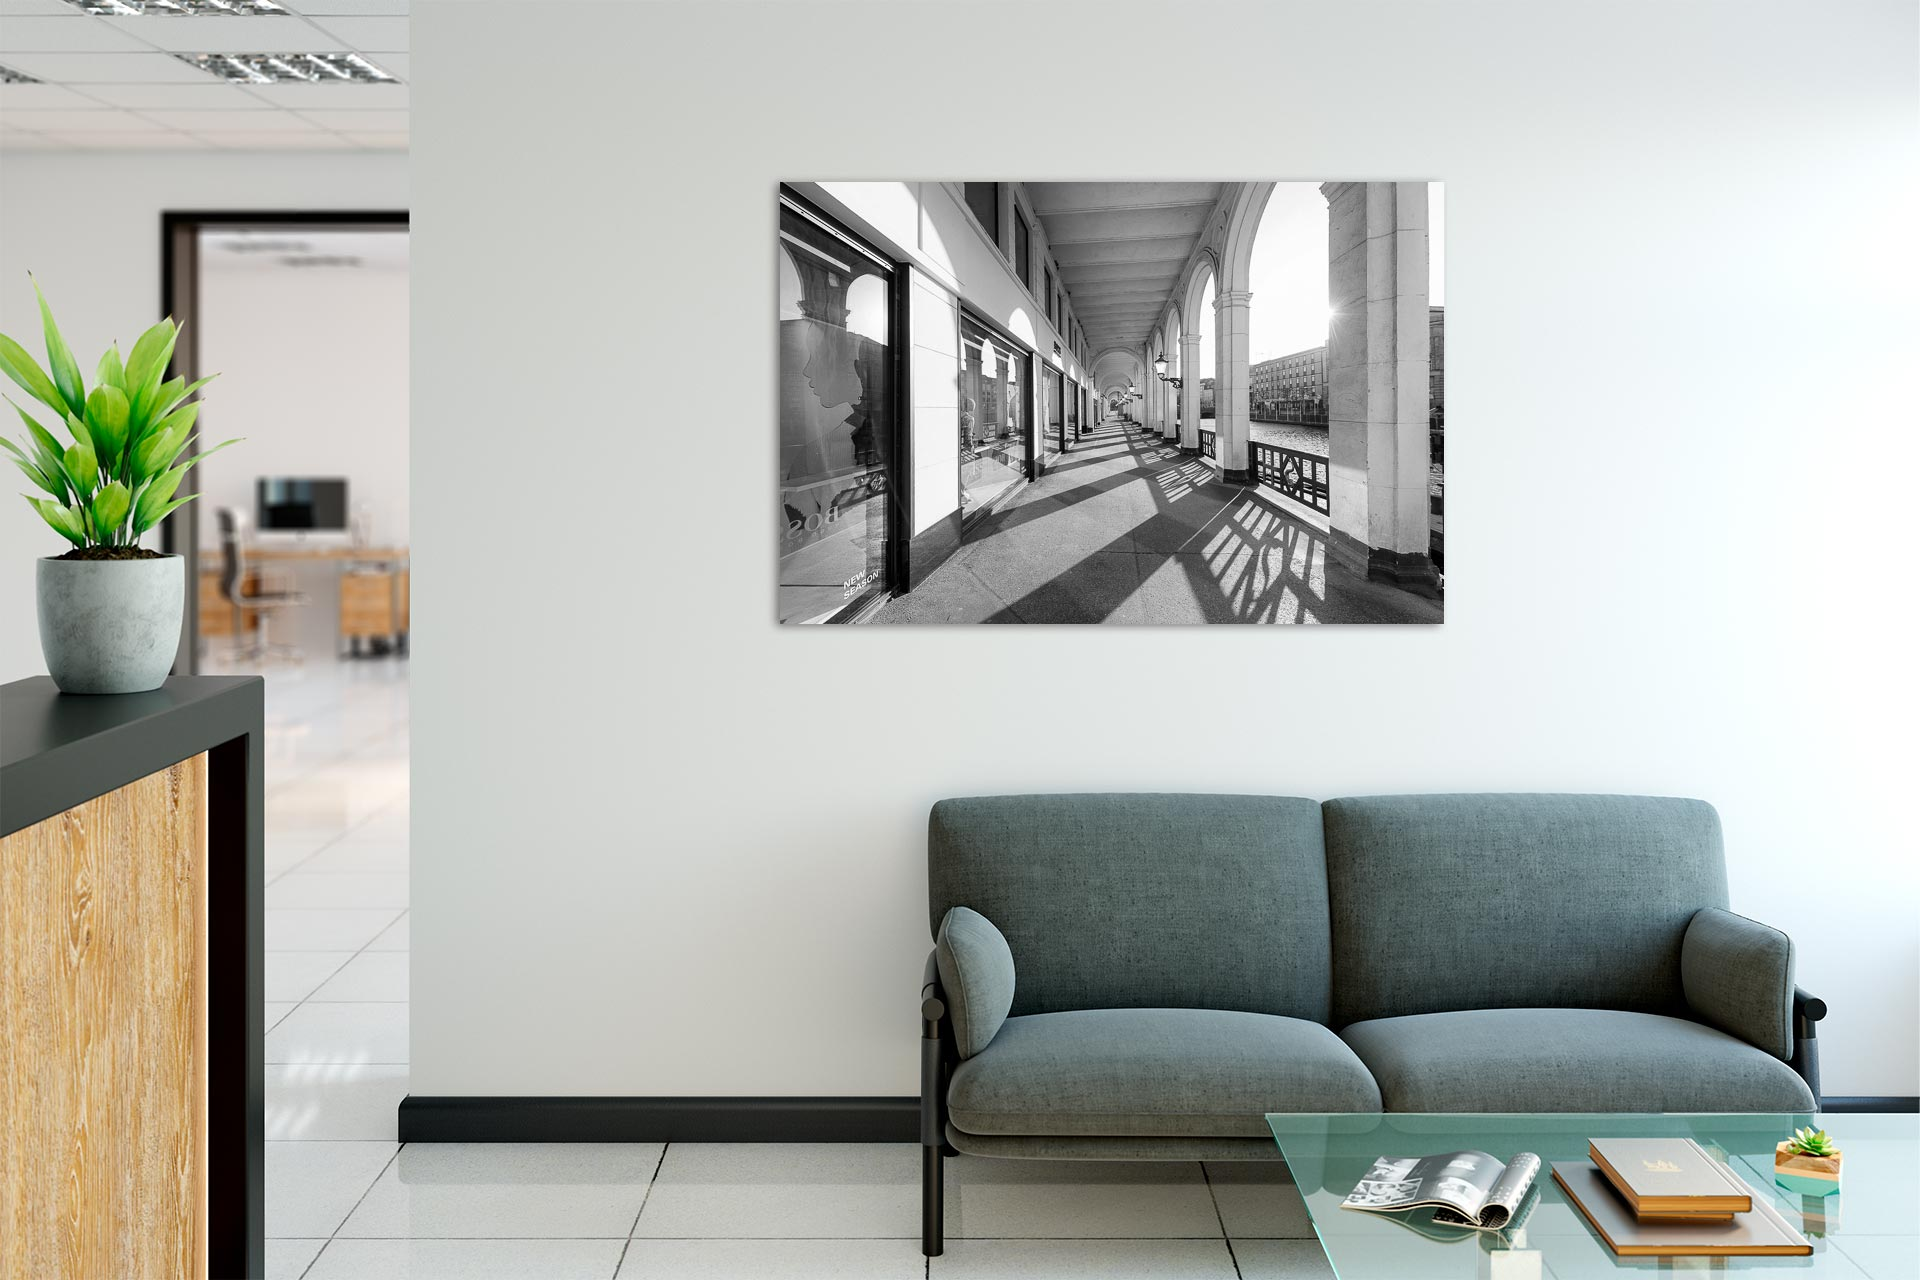 LSW105-alsterarkaden-wandbild-auf-leinwand-acrylglas-aludibond-empfang